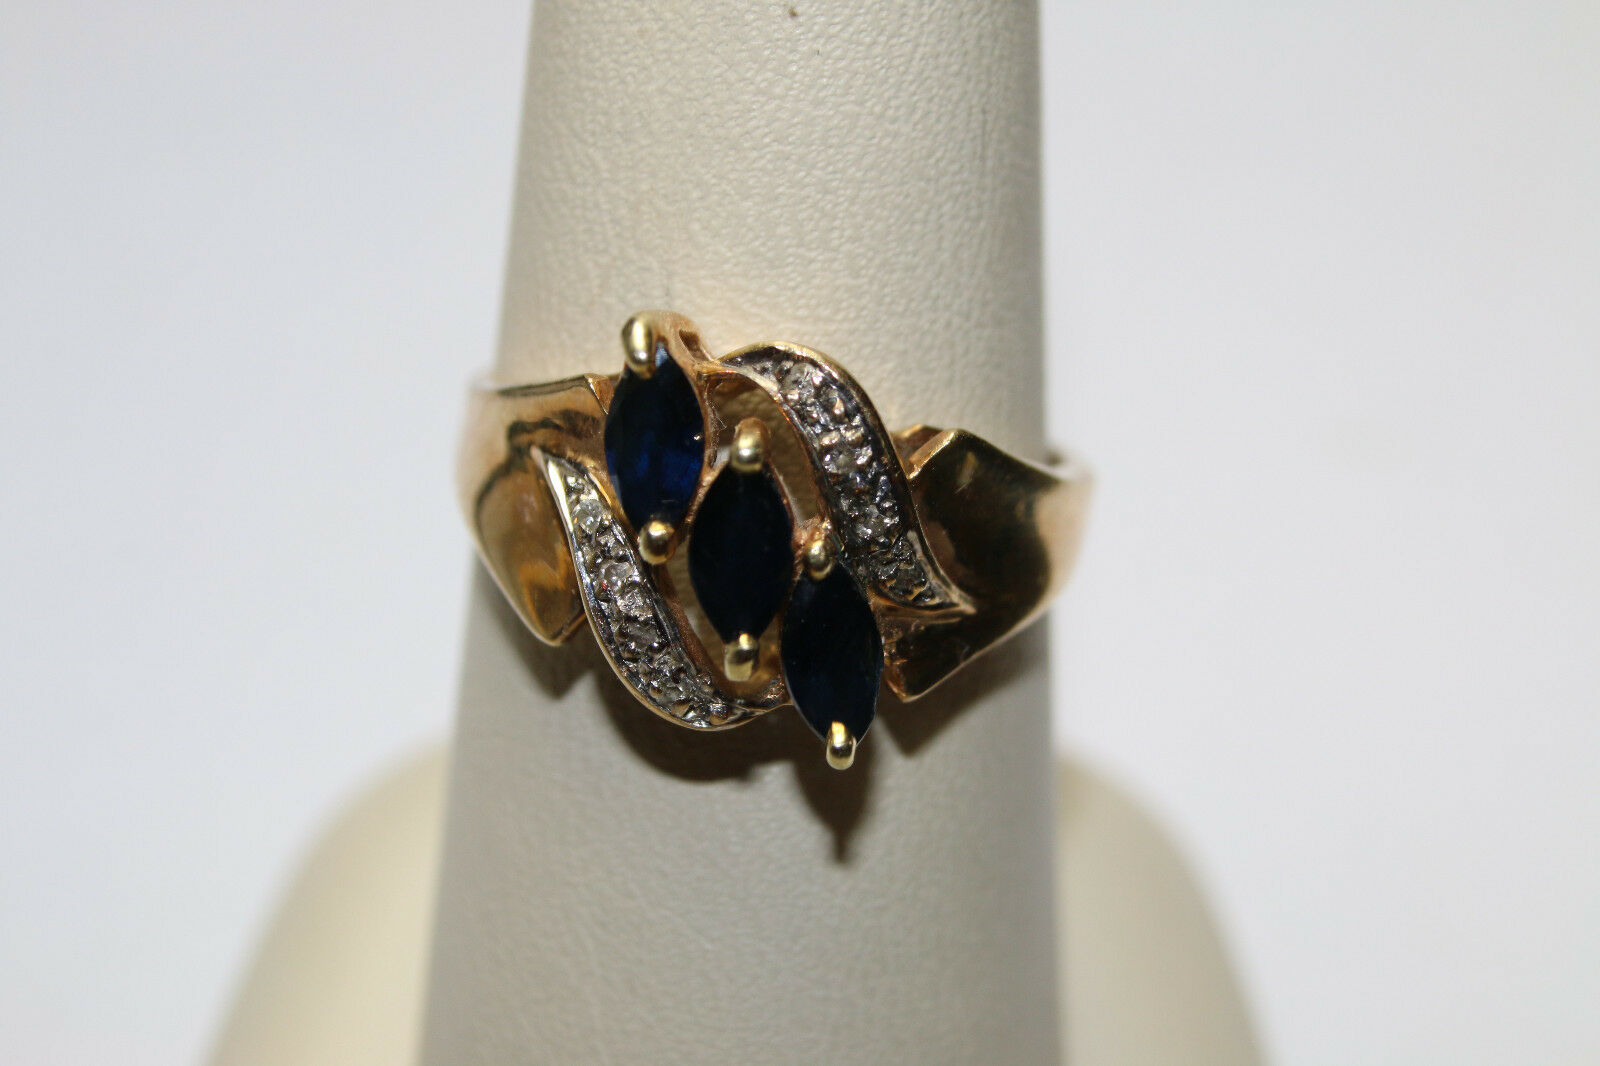 10KYG 3.1 Gram 3 bluee Sapphire 5x3mm each and Diamonds Ring Size 8 NICE     JSH